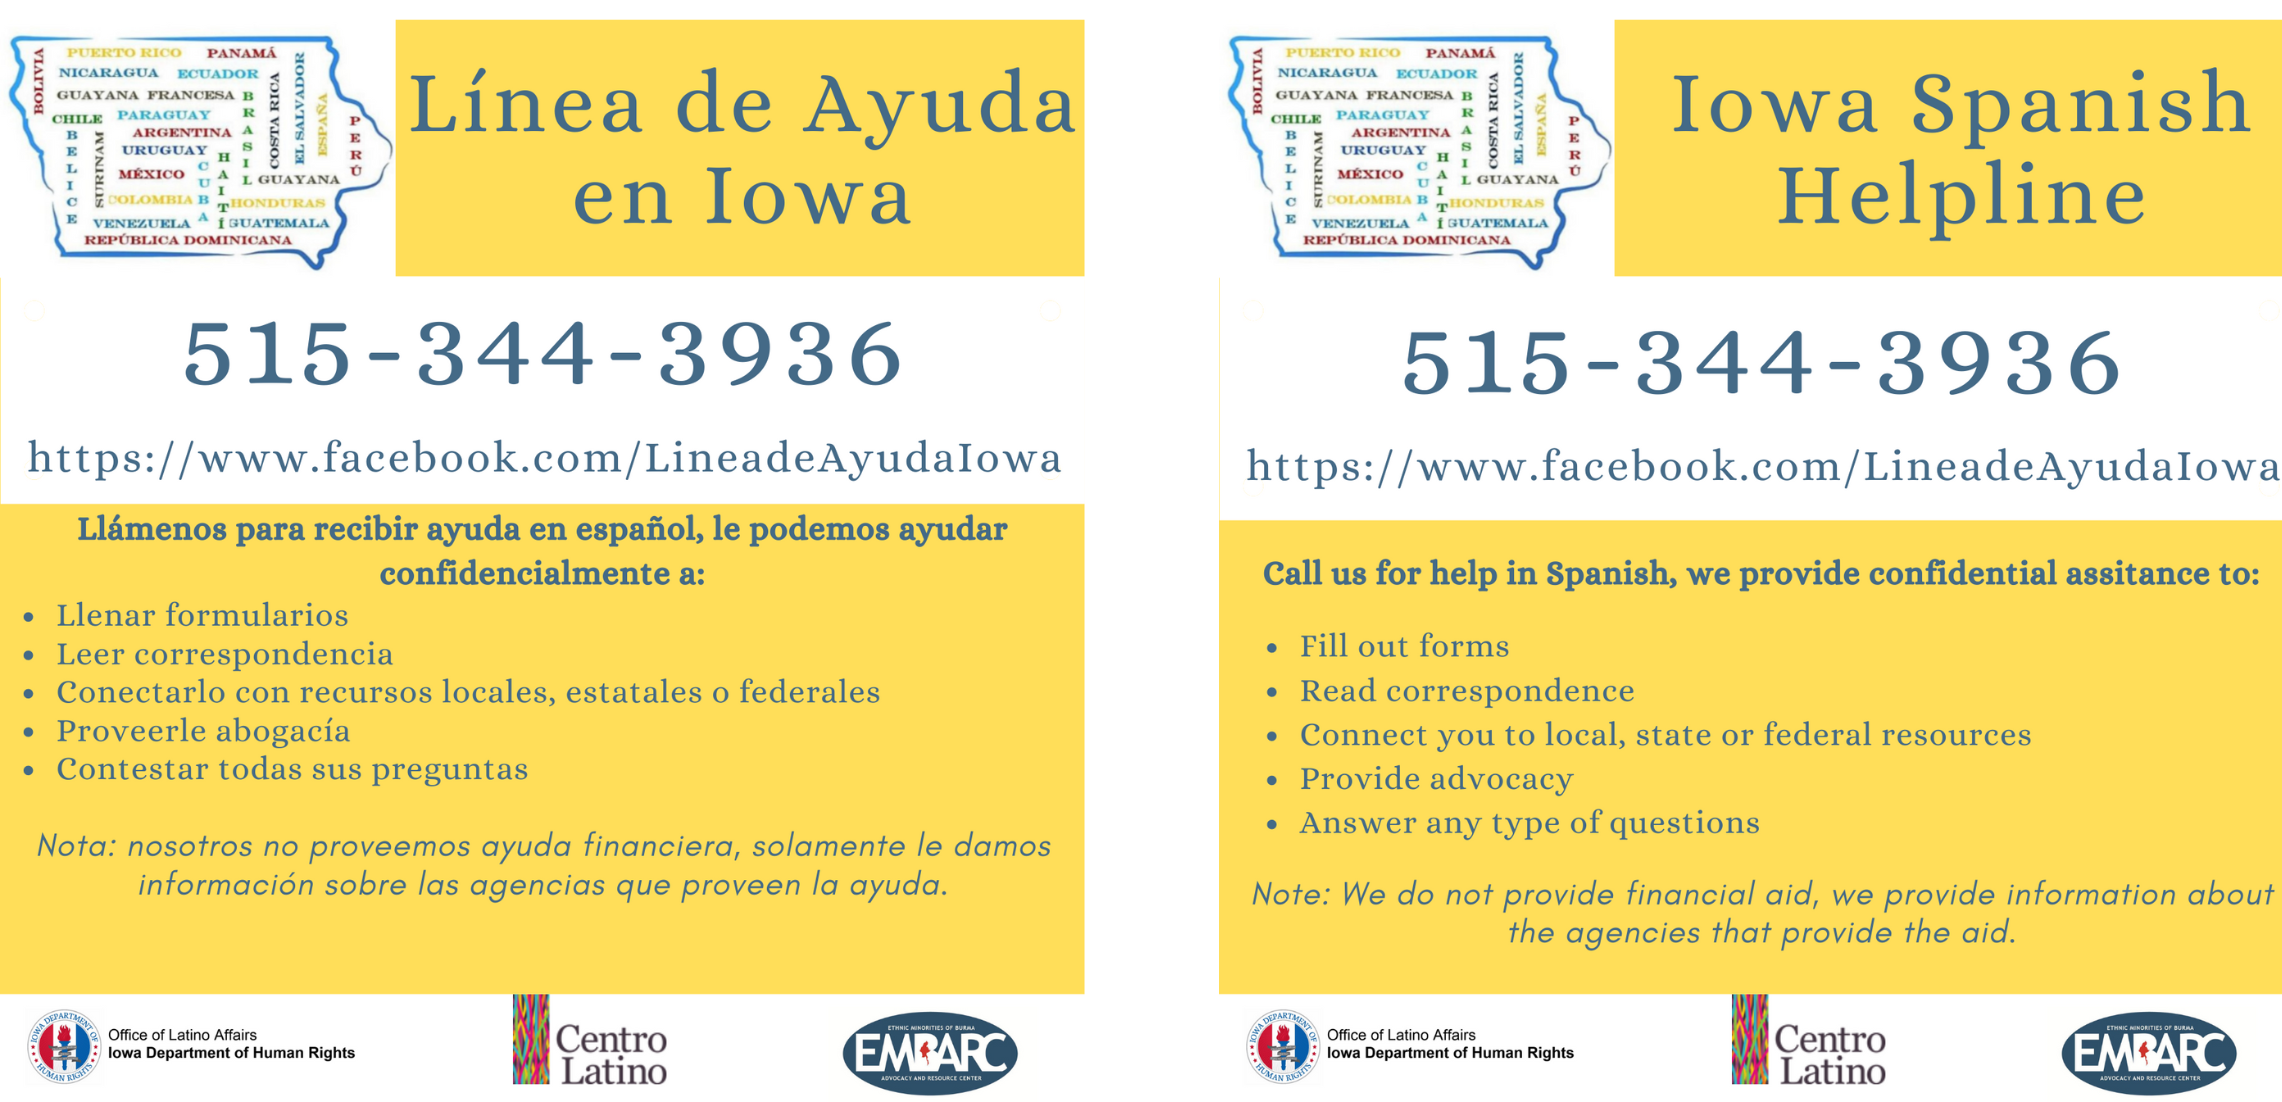 Iowa Spanish Helpline Flyer